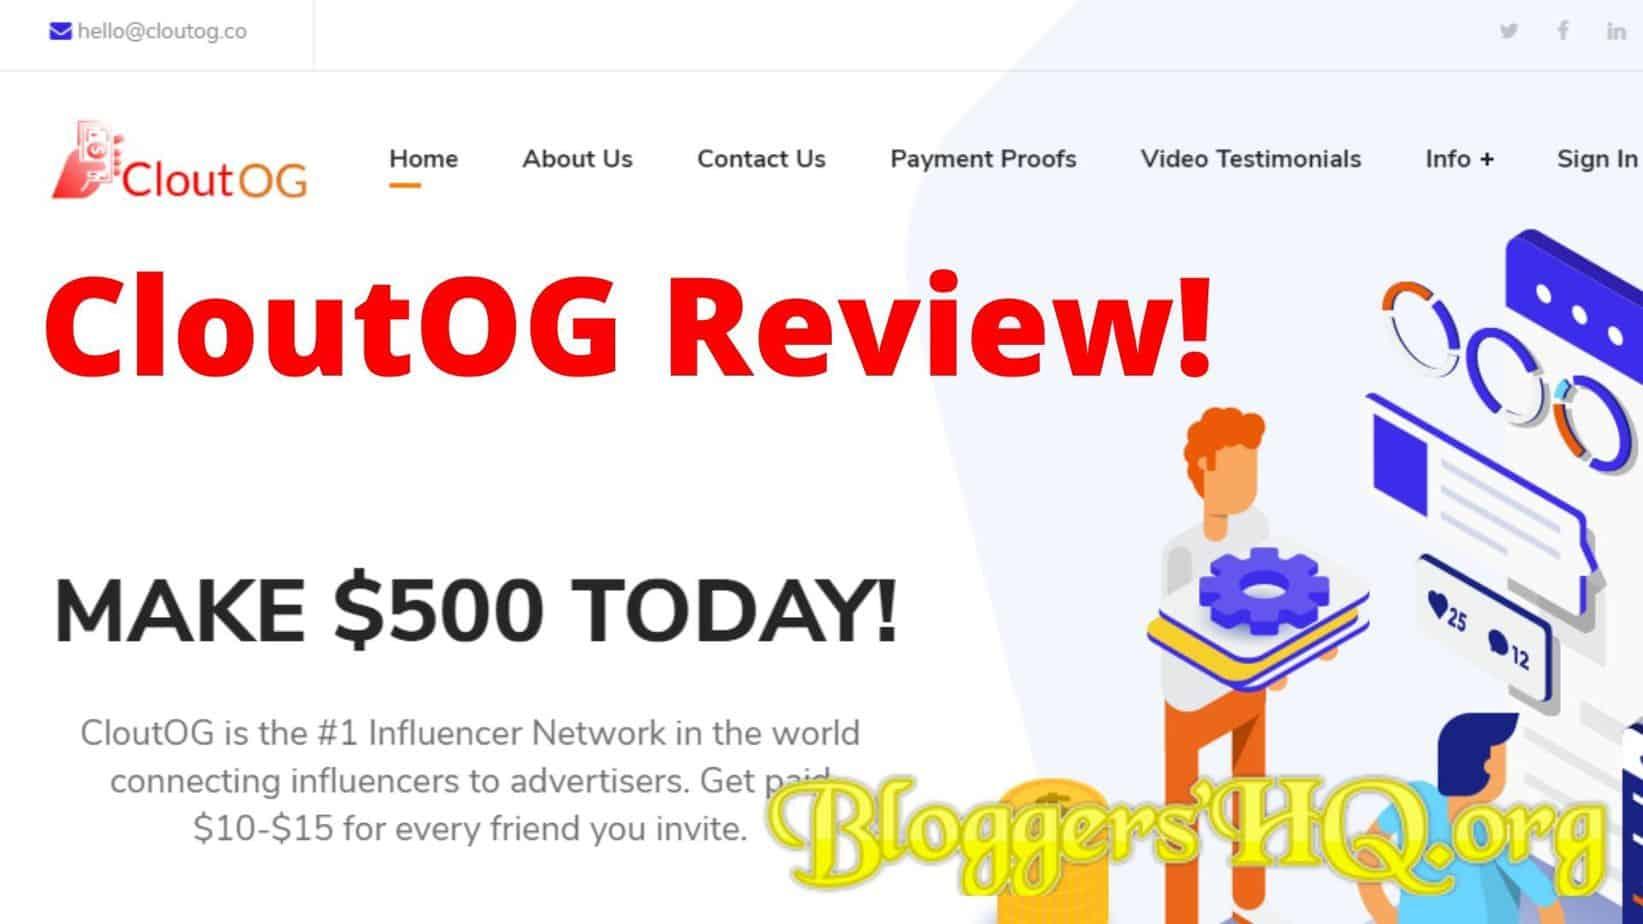 CloutOG Review